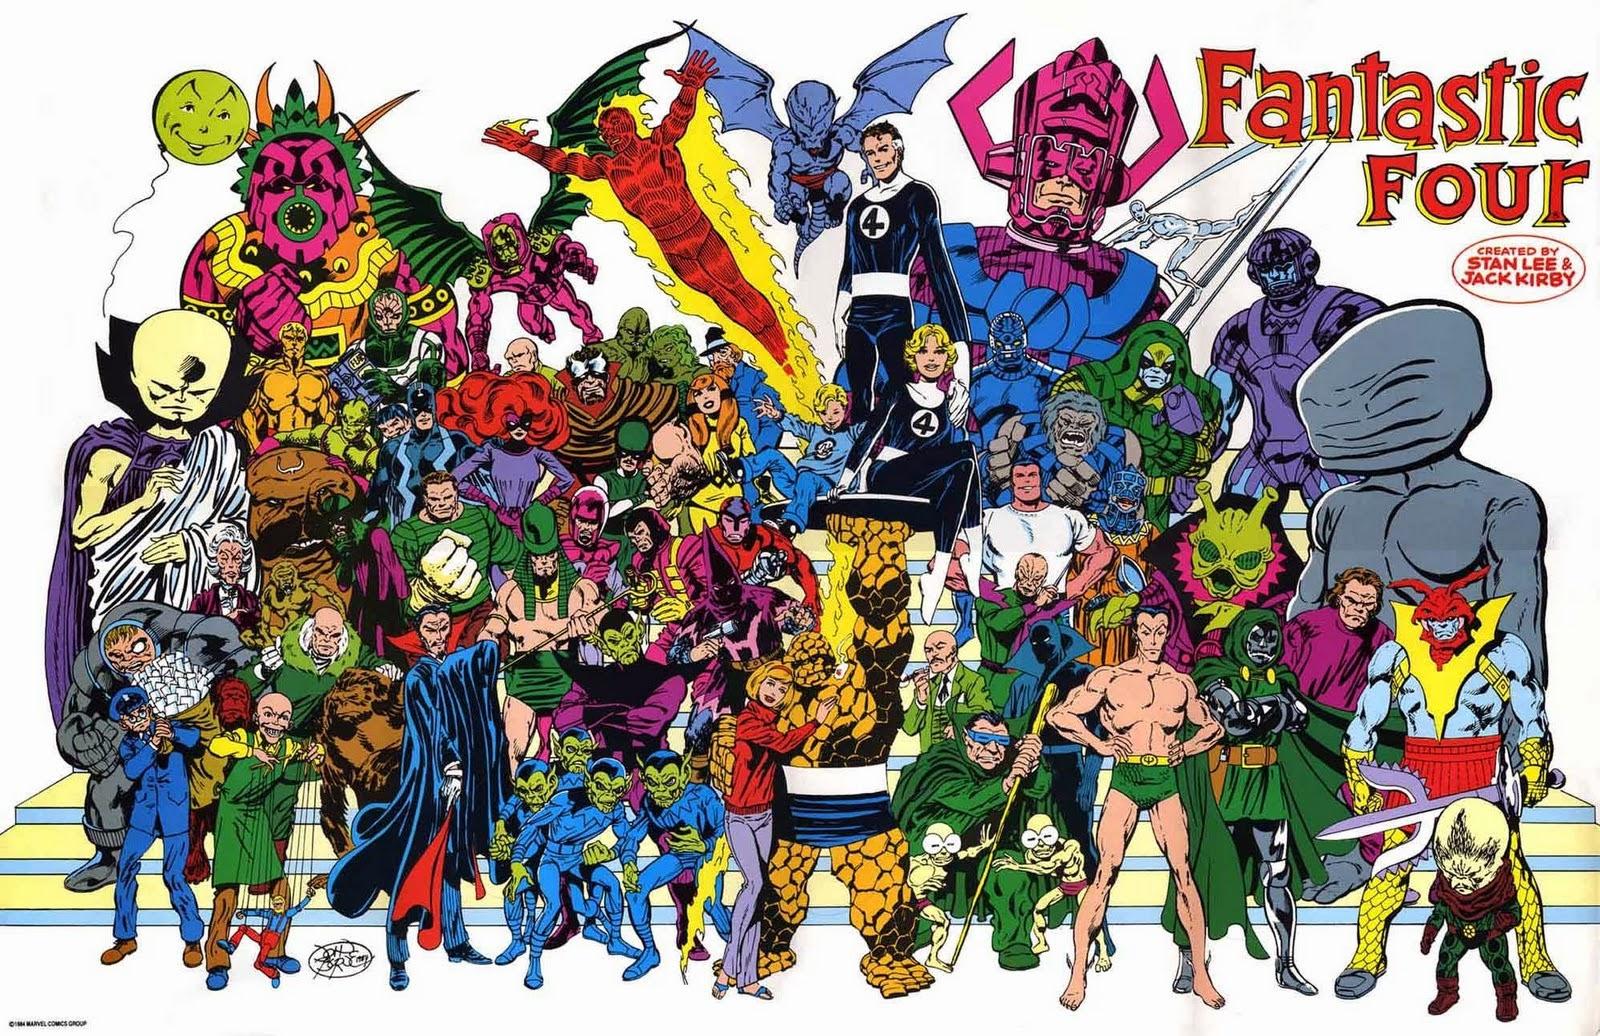 http://4.bp.blogspot.com/-Srq15TiV27g/U57eIVIj_iI/AAAAAAAAPXE/yMJdz6DkWhk/s1600/Fantastic+Four+by+John+Byrne.jpg